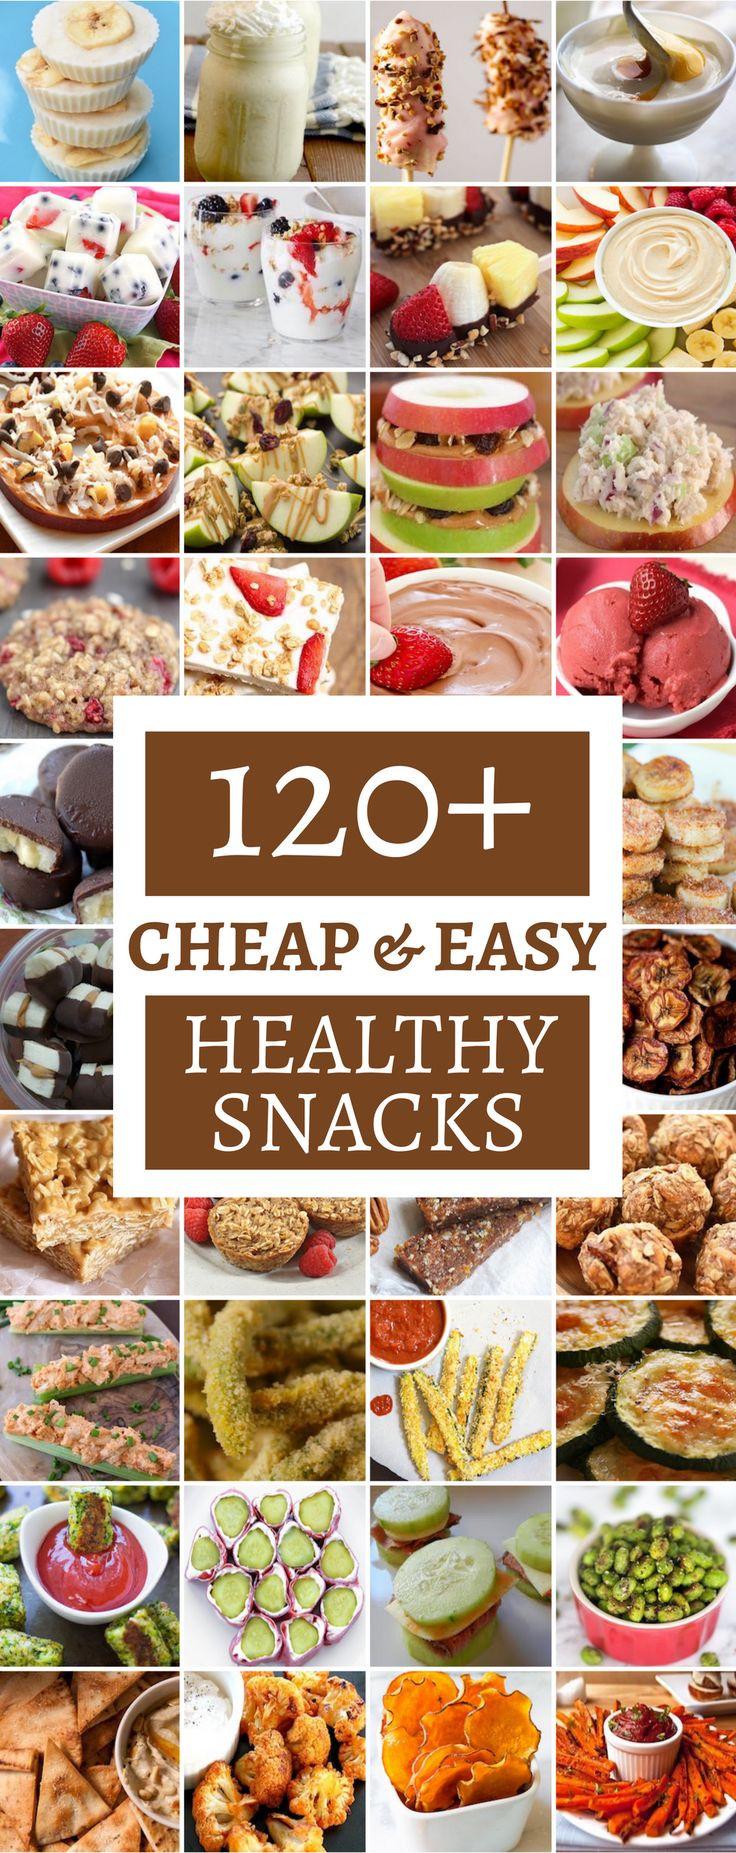 Healthy Cheap Snacks  Best 25 Cheap healthy snacks ideas on Pinterest